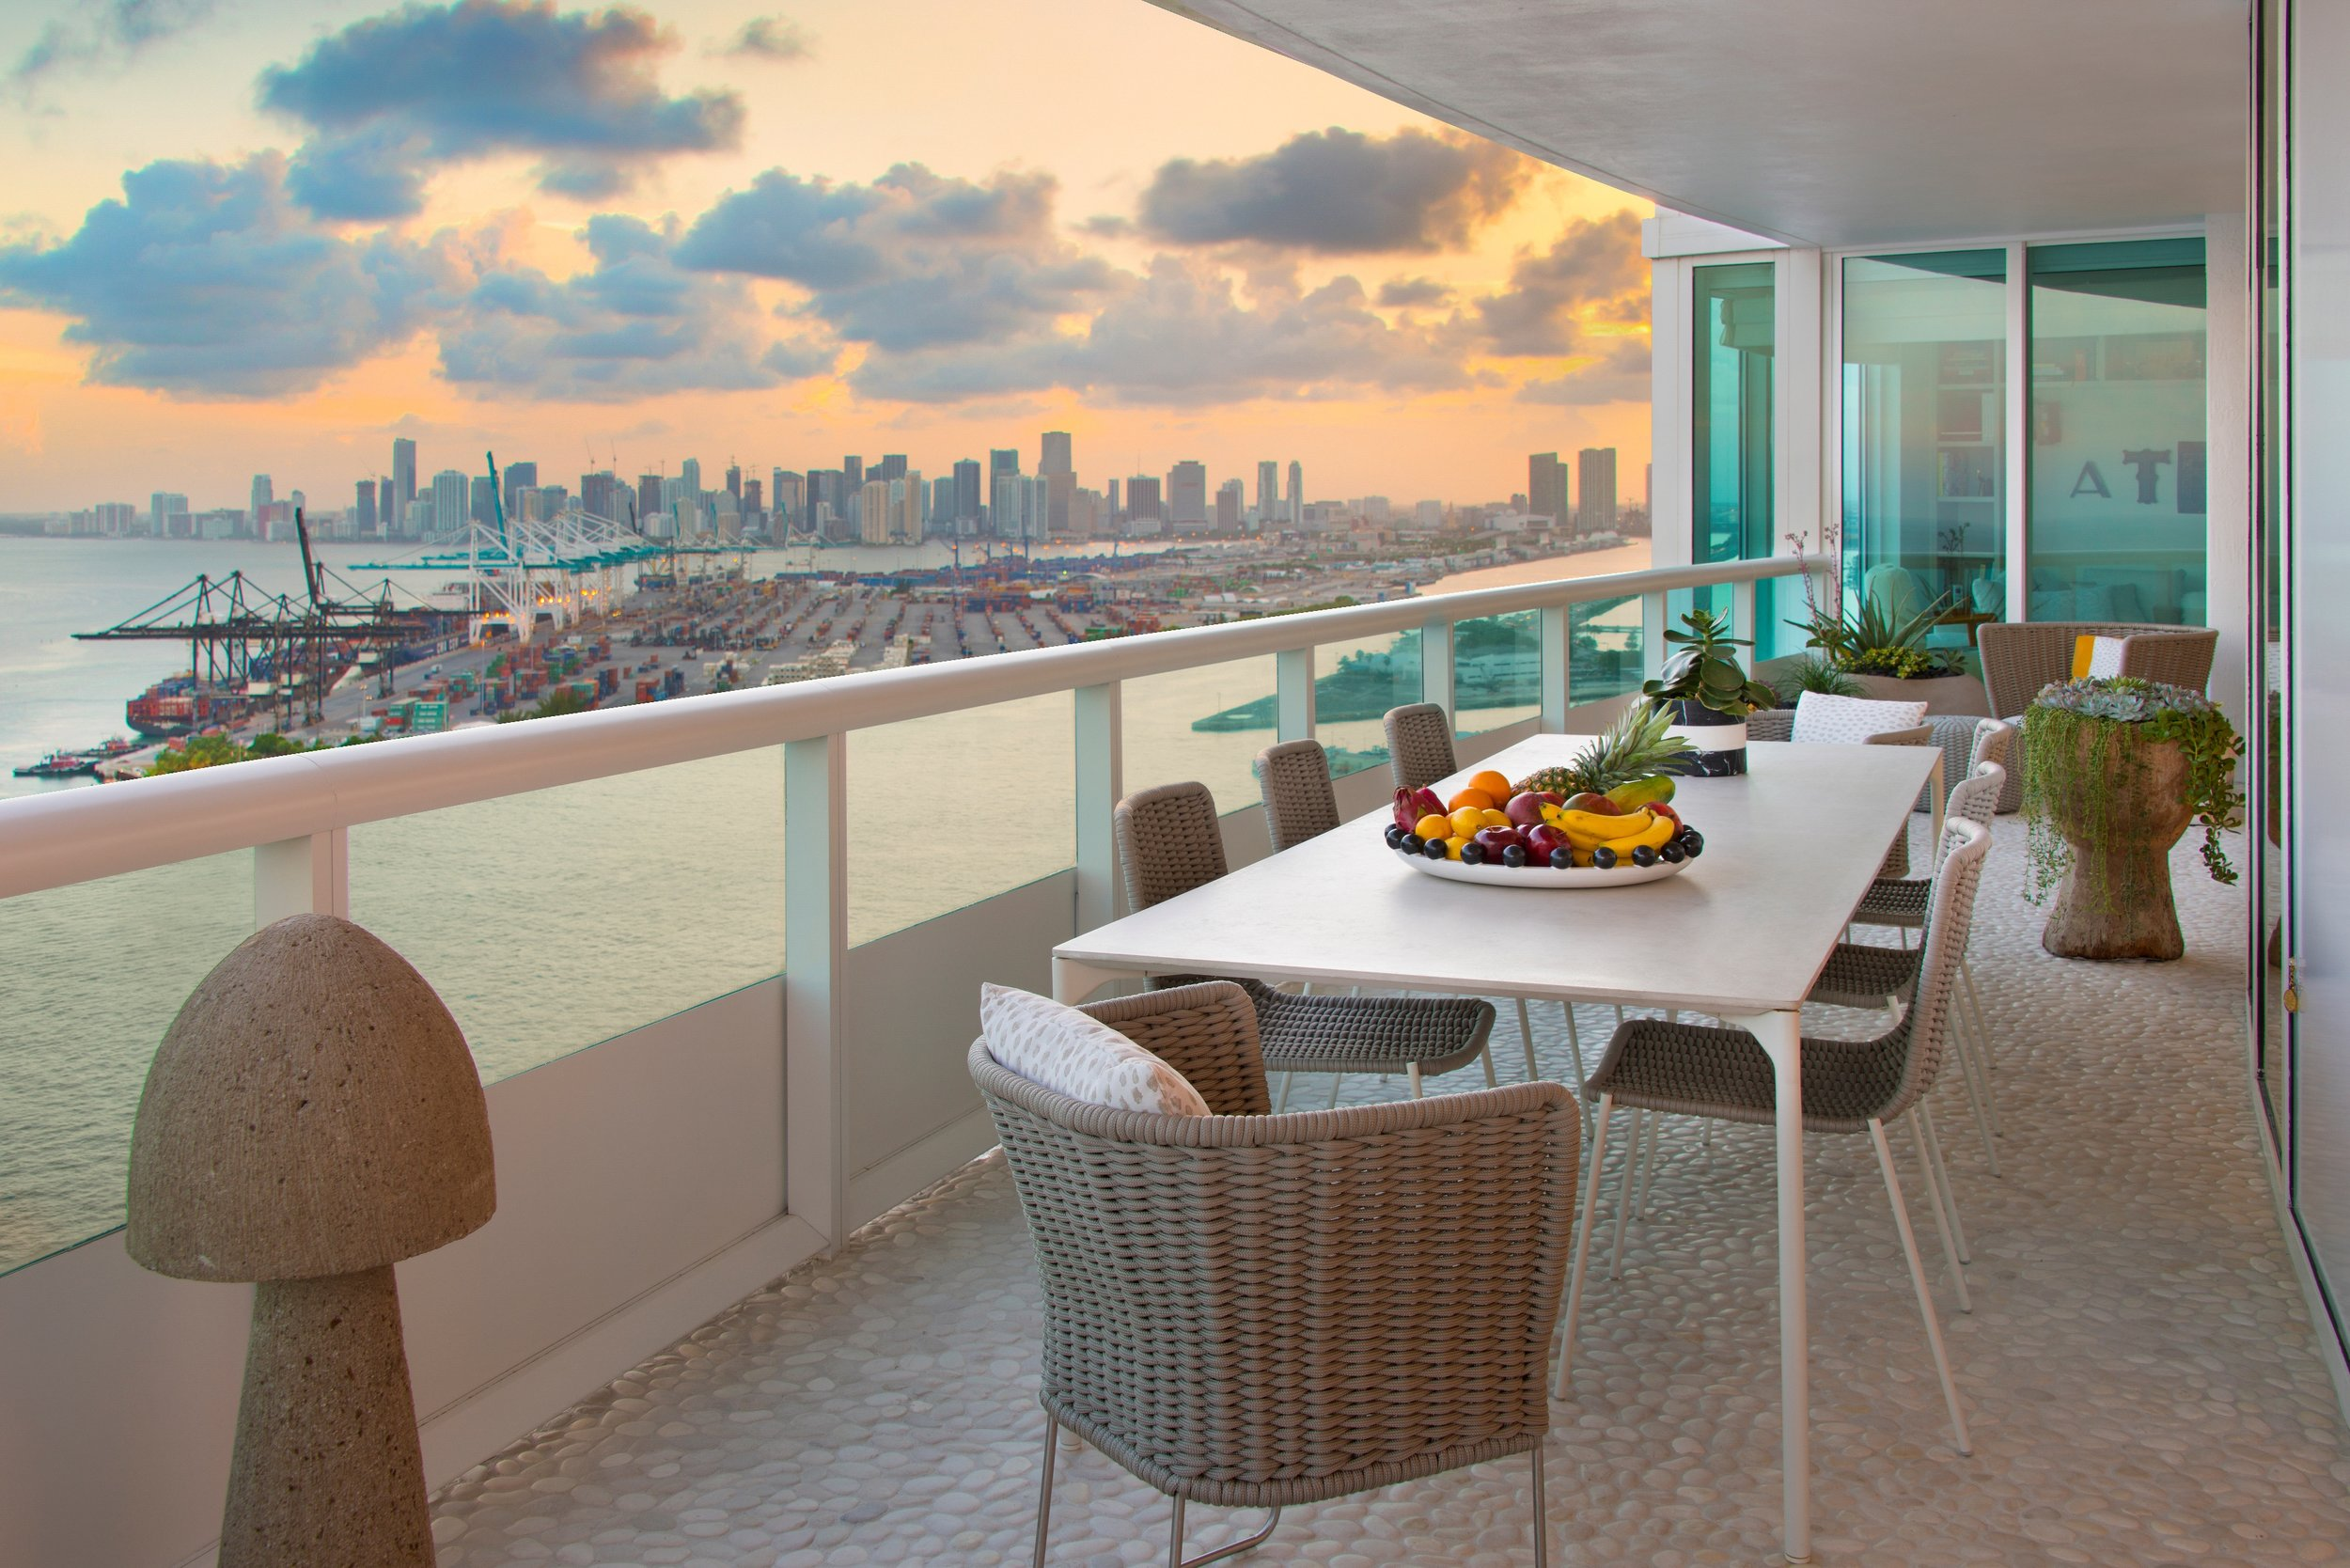 23-Terrace.jpg